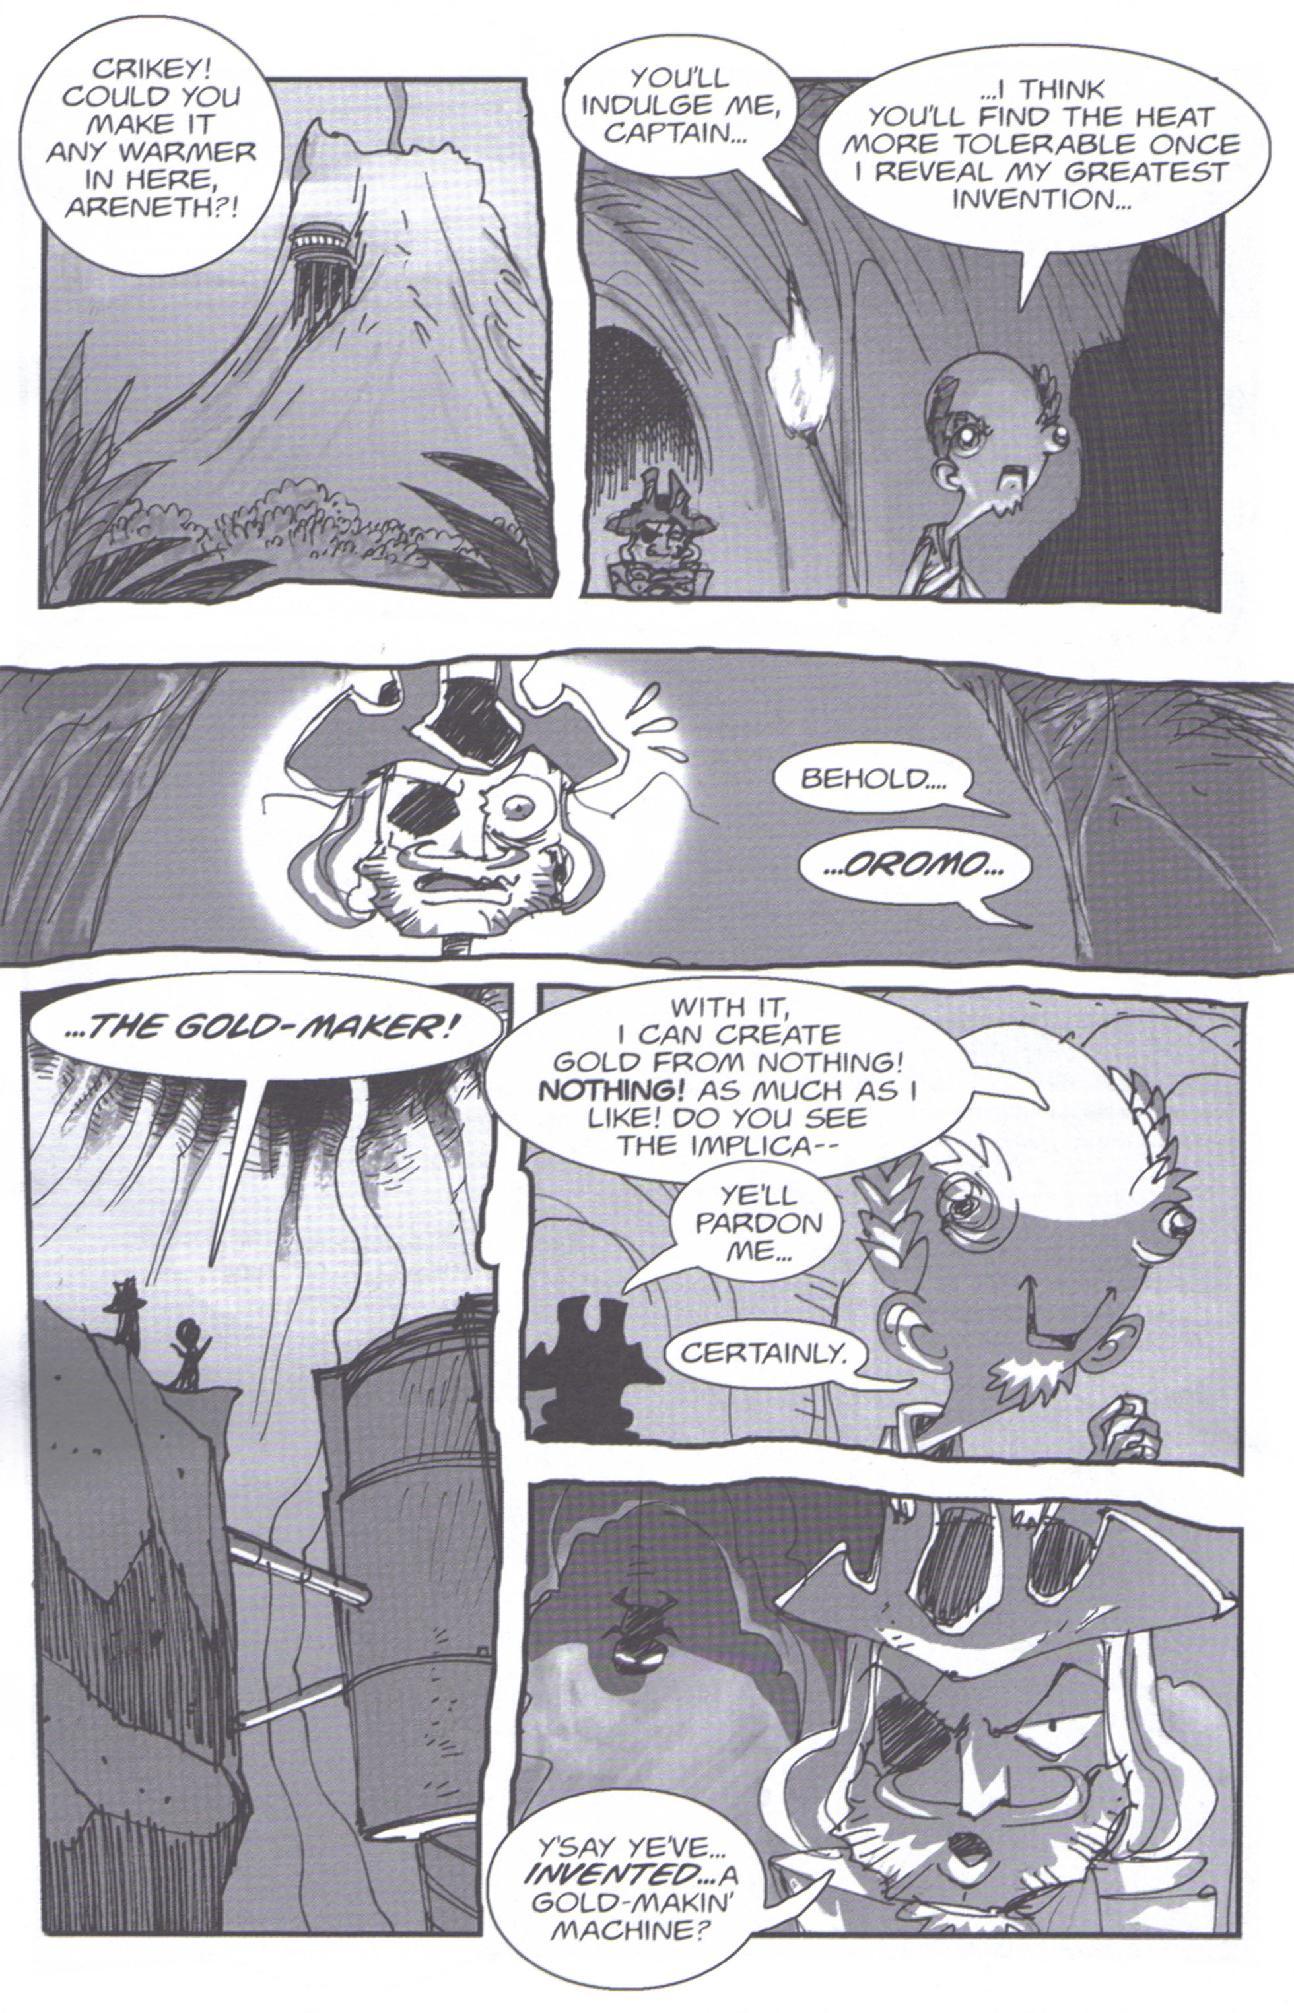 Read online Pirates vs. Ninjas: Global Harming comic -  Issue # Full - 19